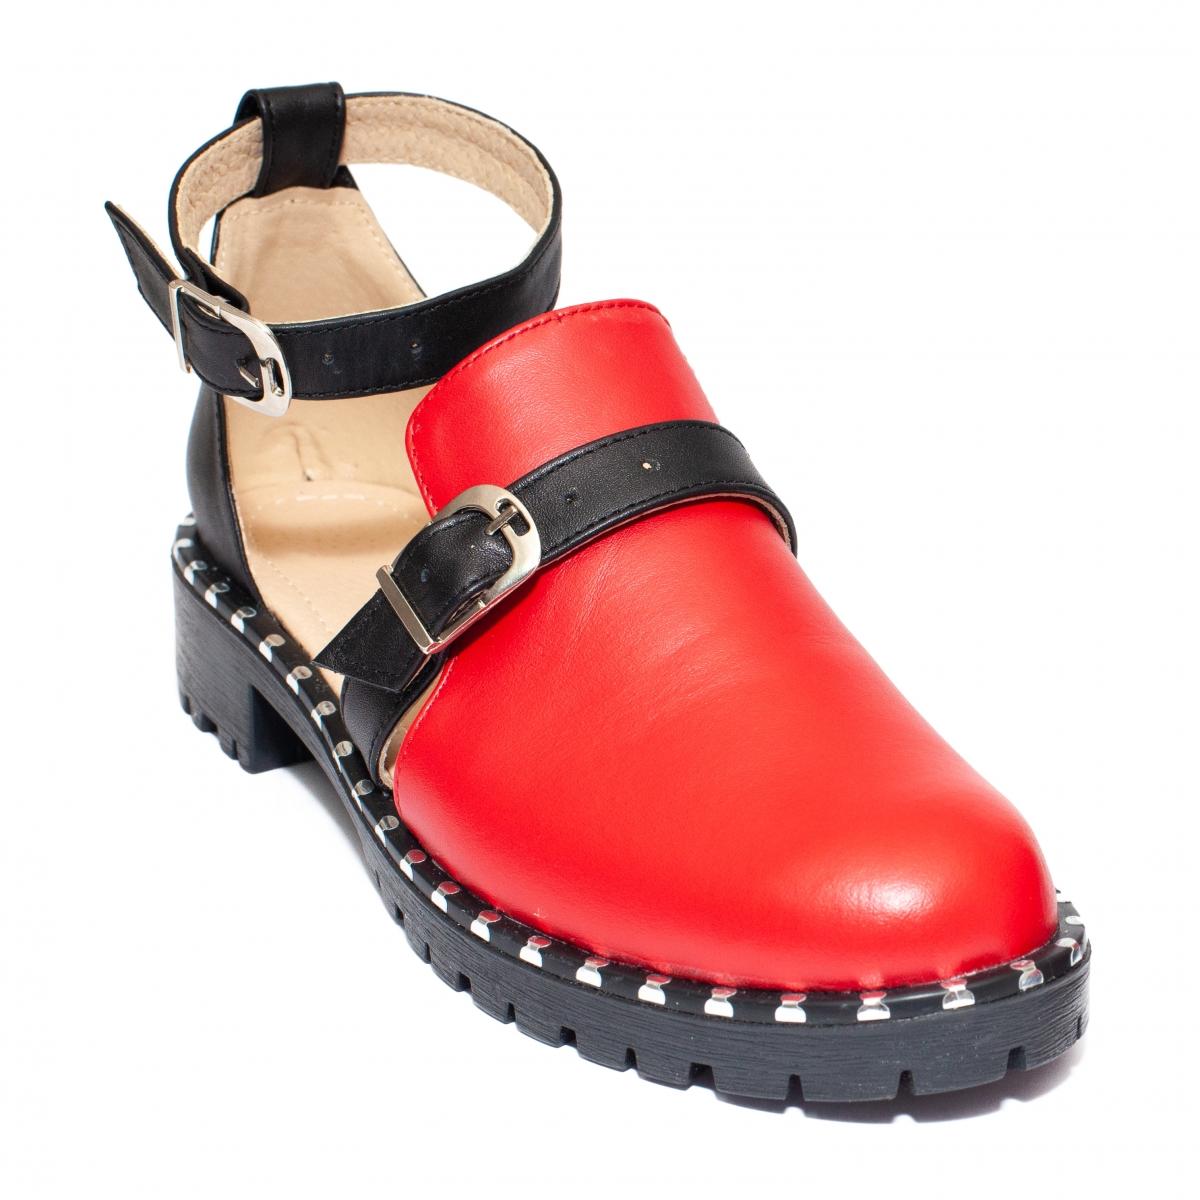 Sandale dama piele 1803 Cika bej negru 35-40